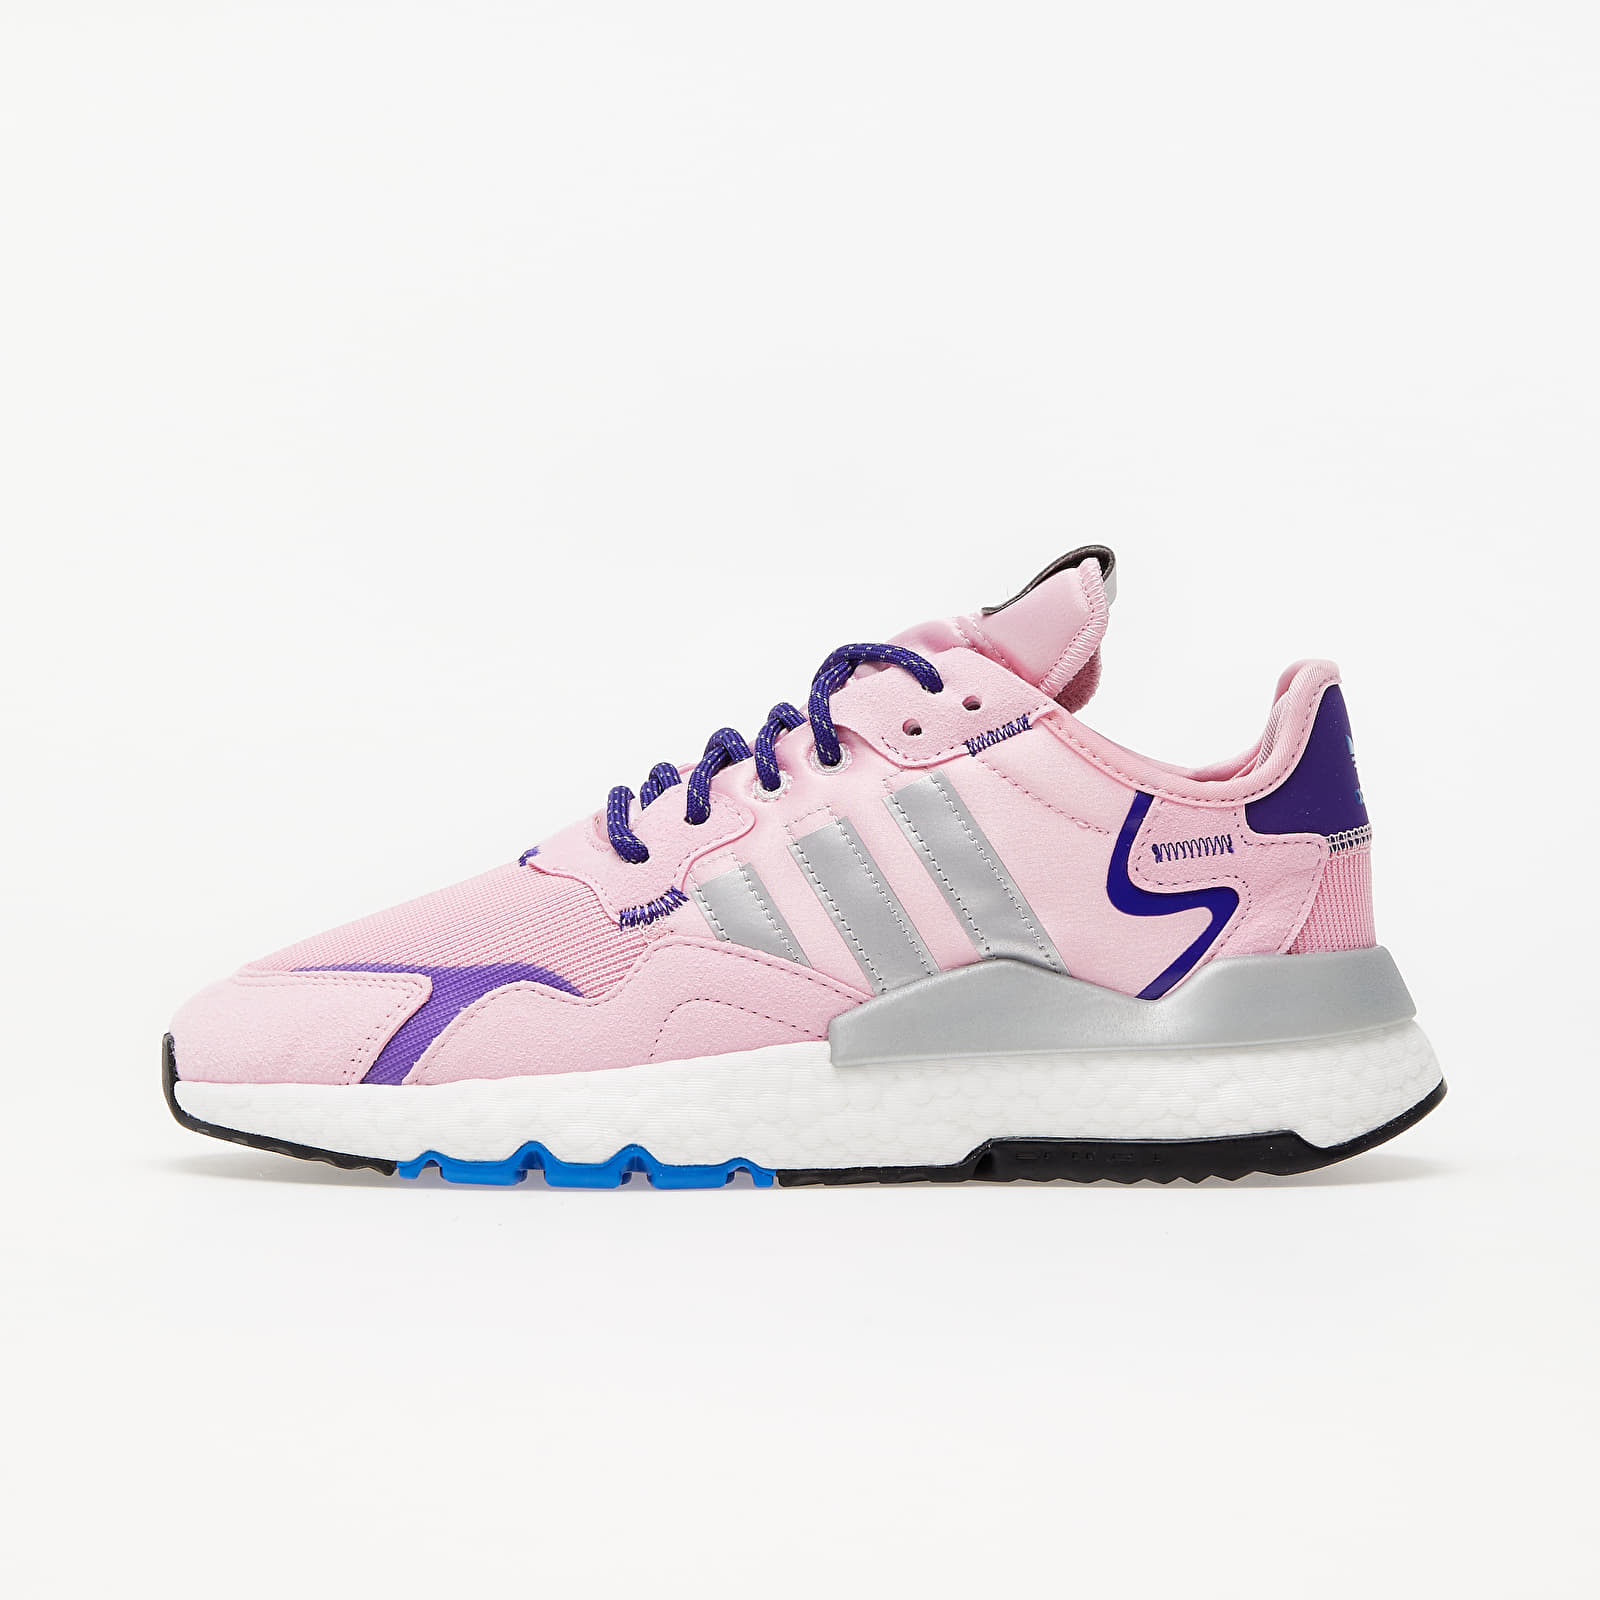 adidas Nite Jogger W True Pink/ Silver Met./ Collegiate Purple FX6911